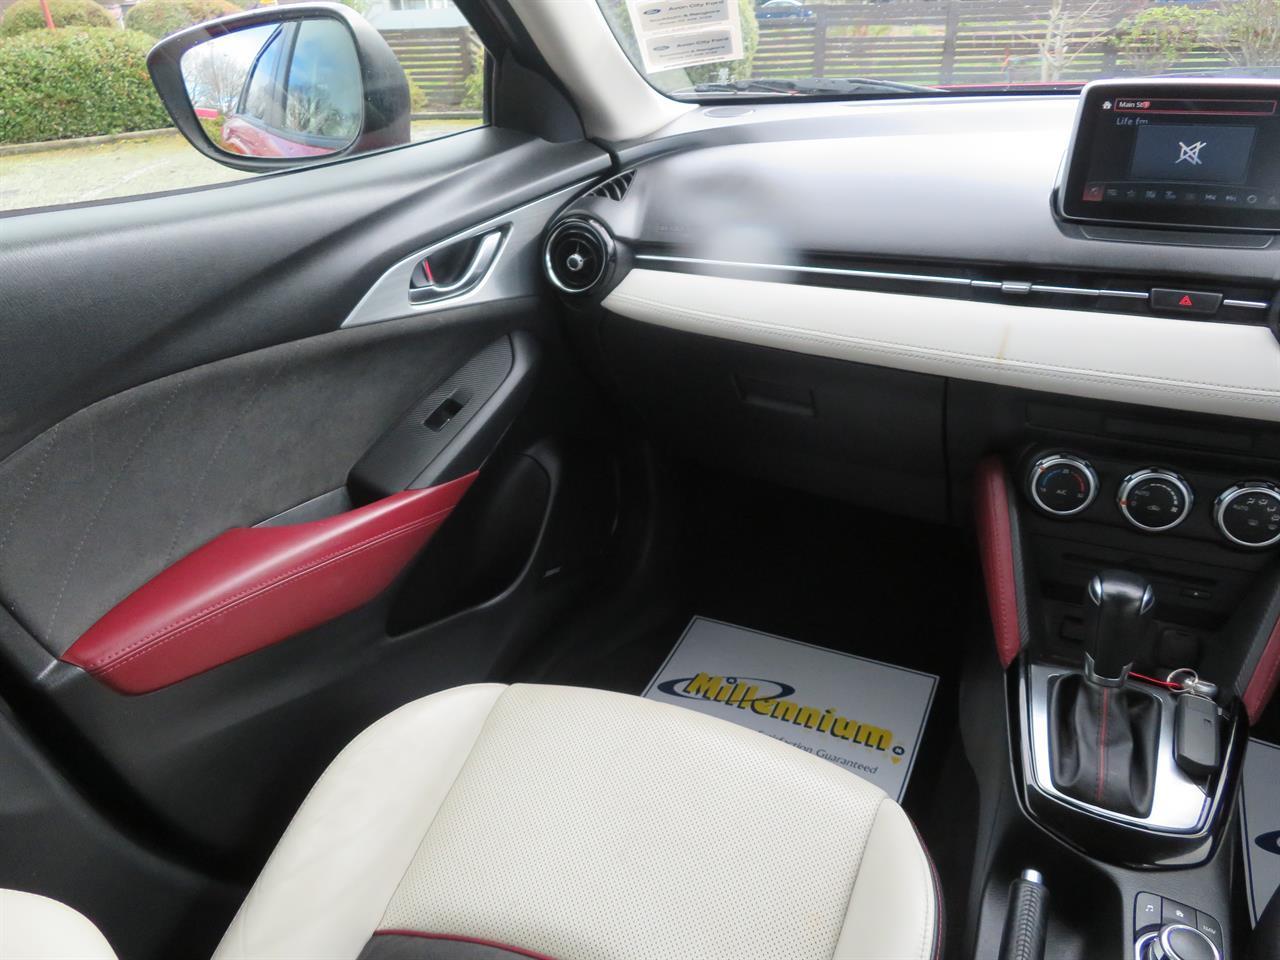 image-10, 2015 Mazda CX-3 LTD AWD at Gore